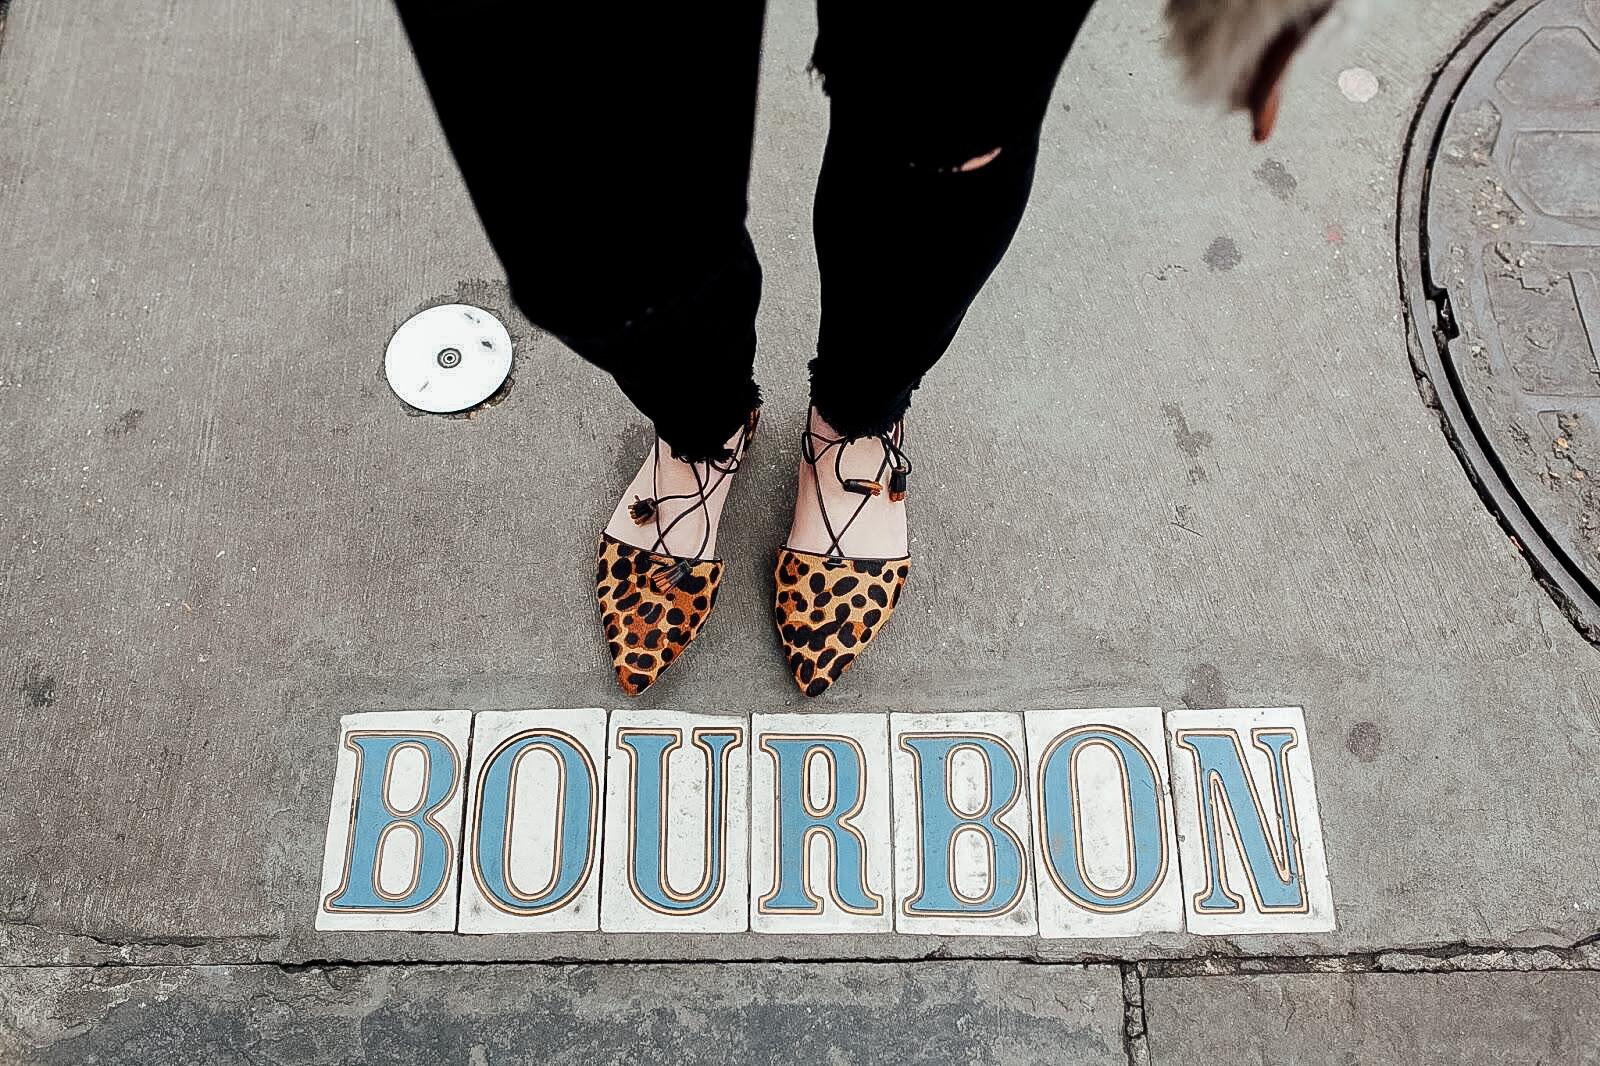 The Best Weekend Getaways from Memphis, TN featured by top Memphis blogger, Walking in Memphis in High Heels.